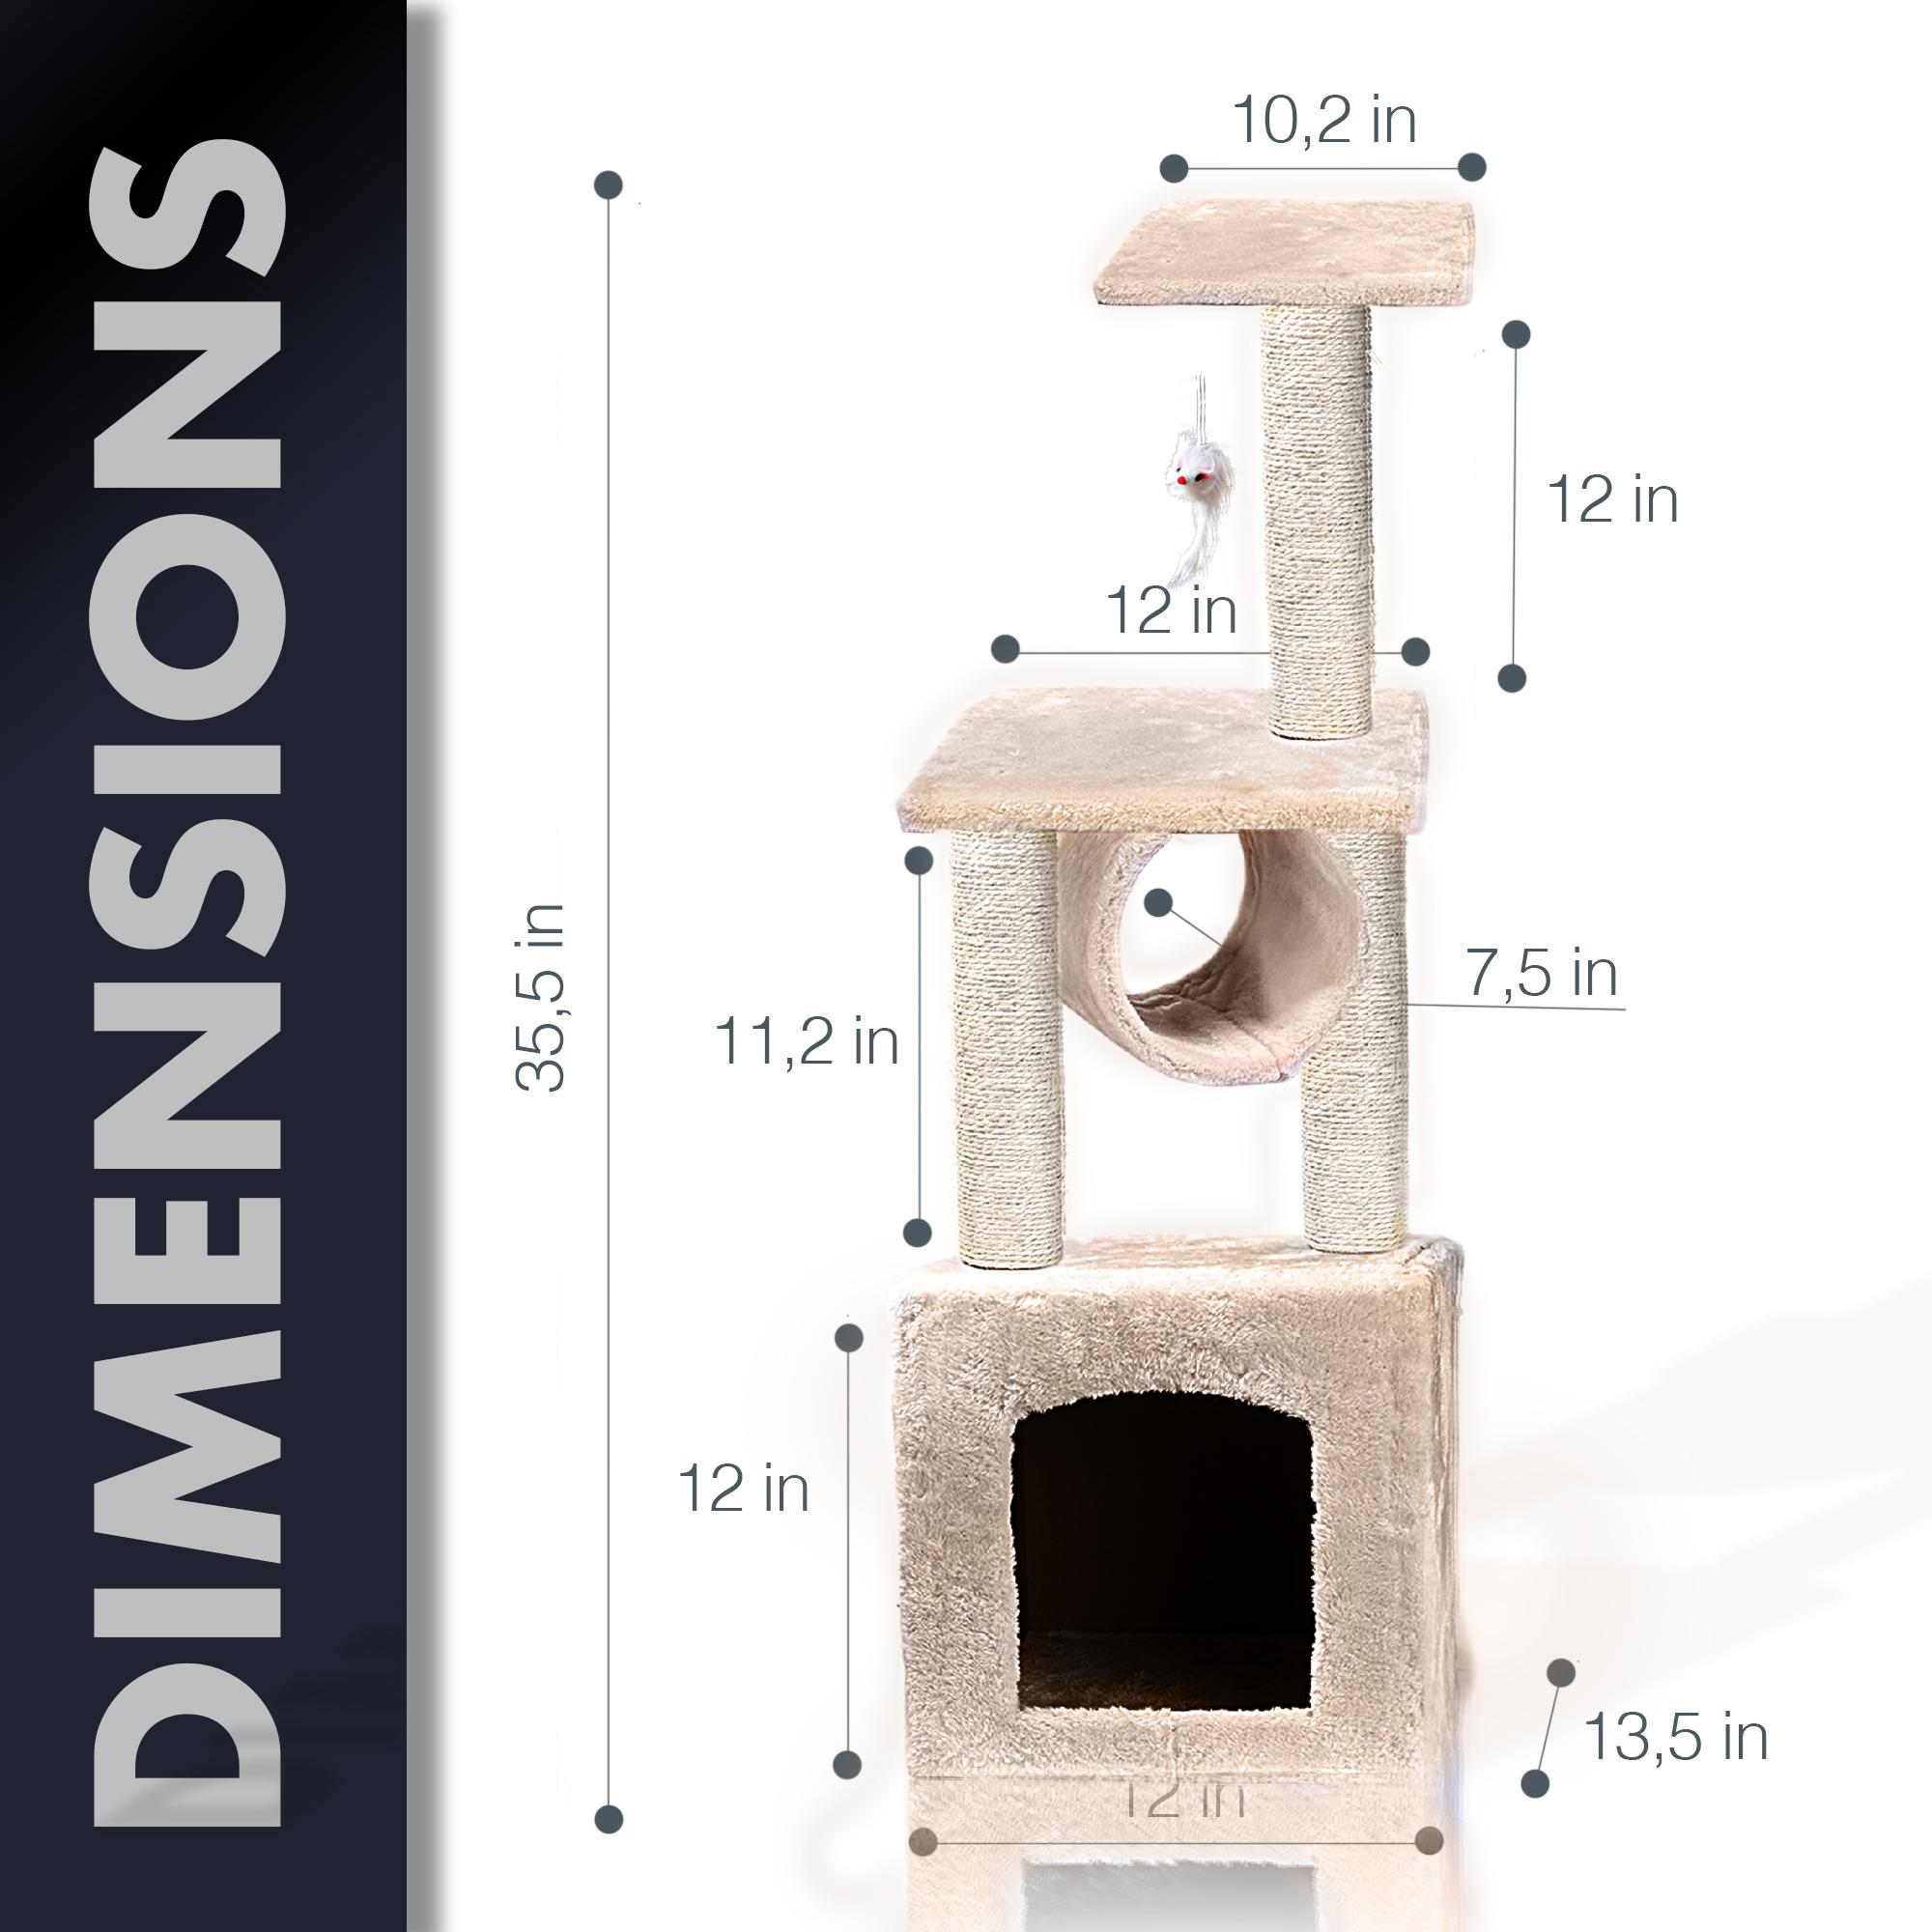 dimensionsA.jpg